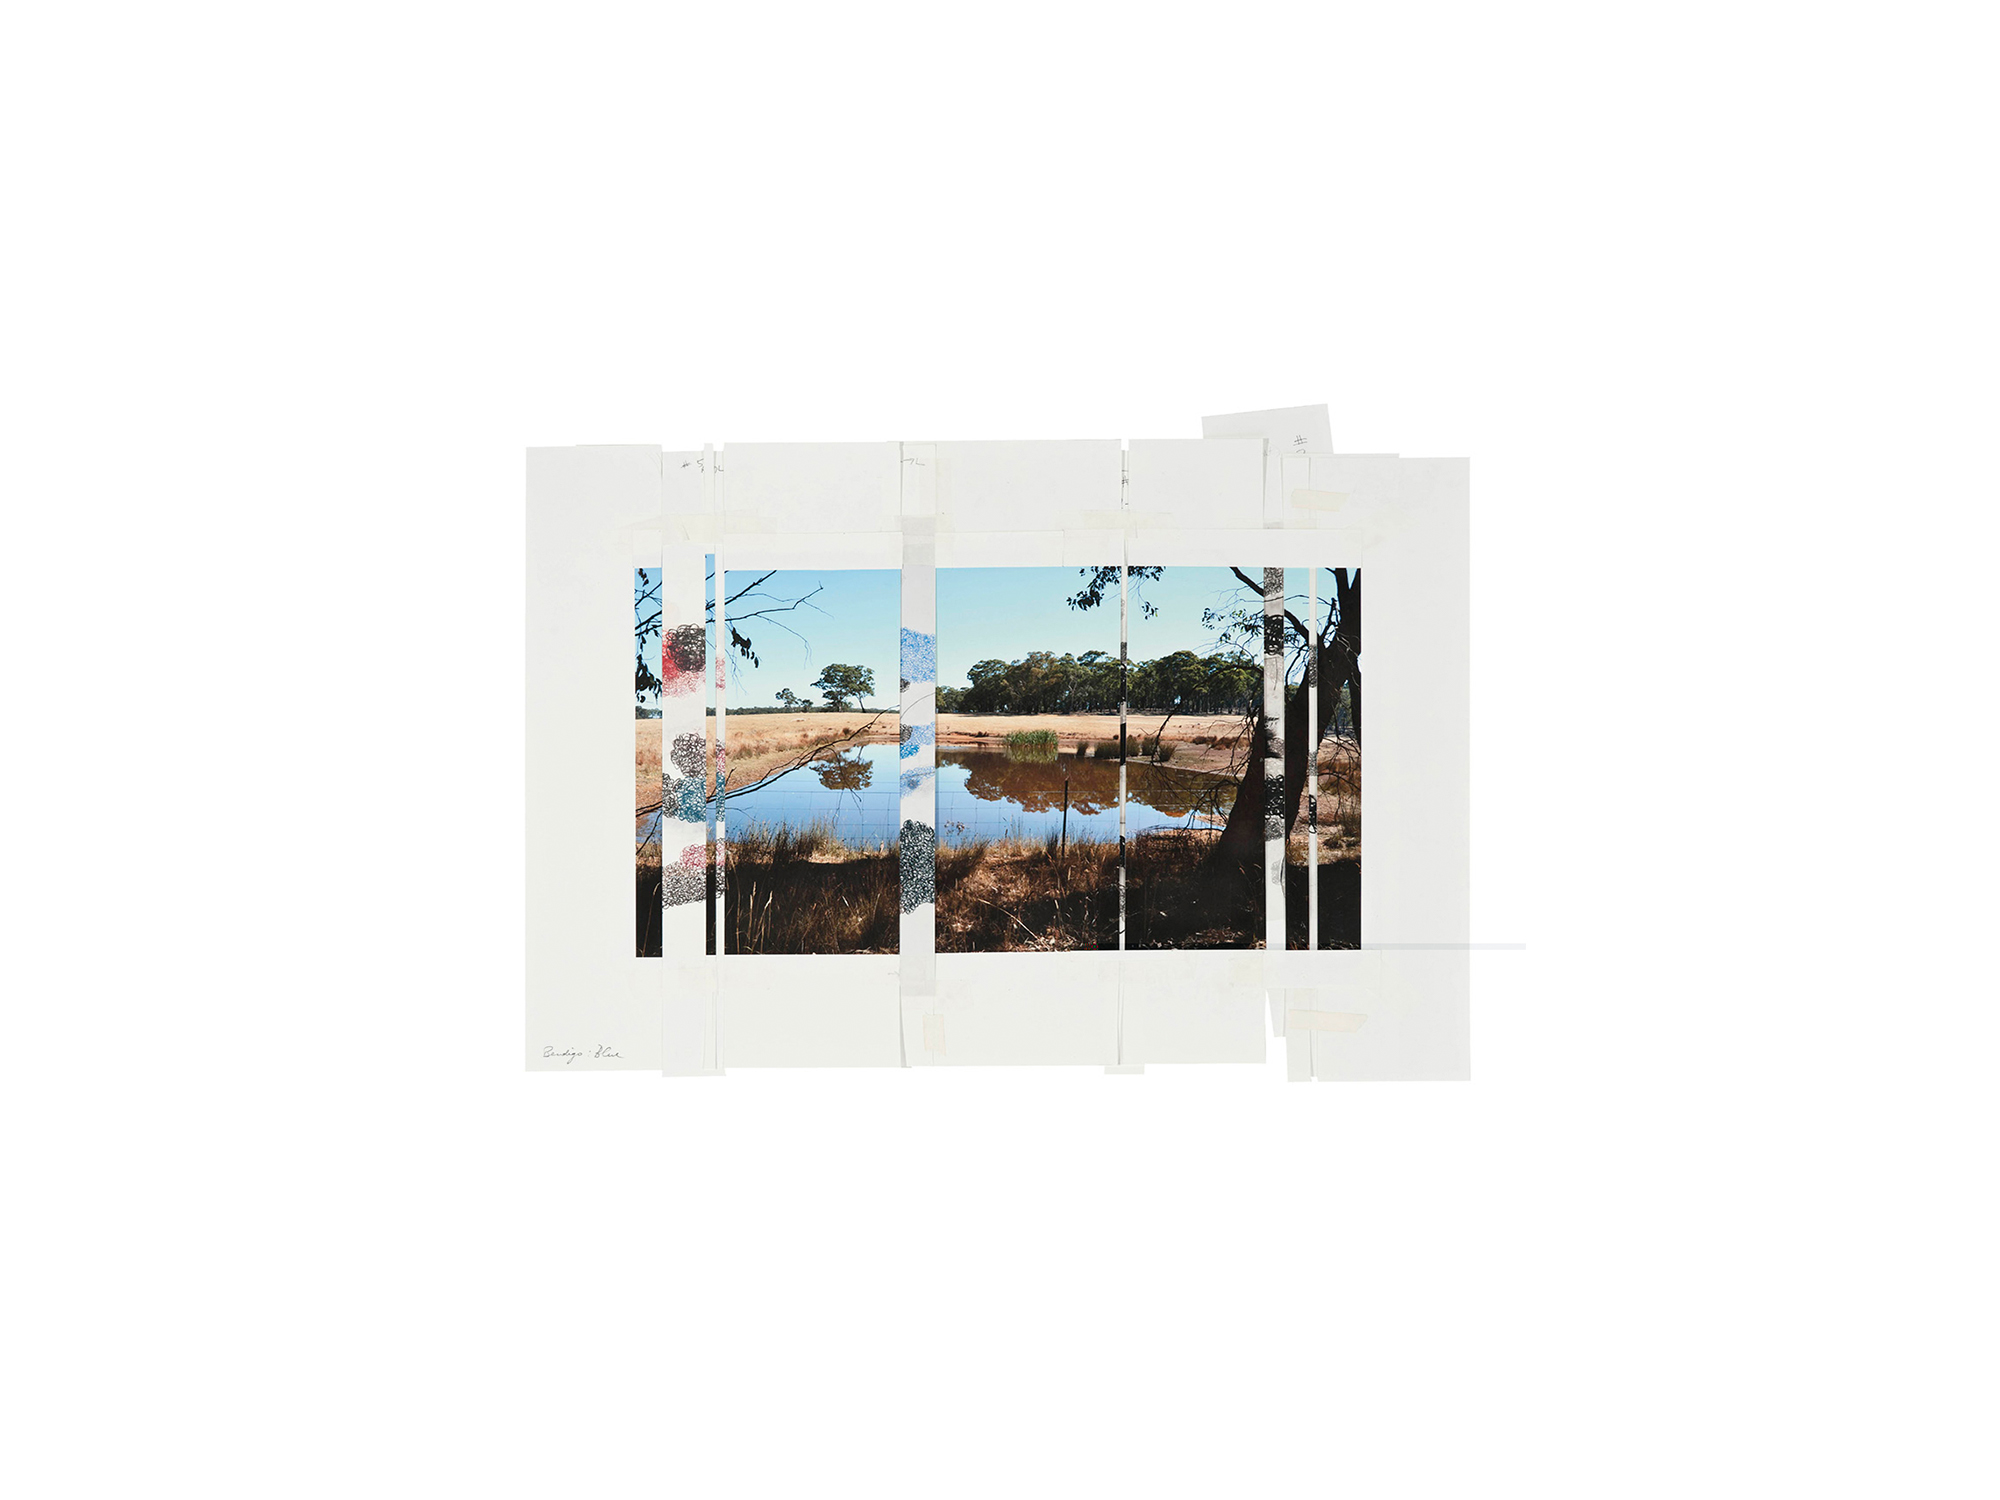 Denise Green   Bendigo Blue , 2015 one photograph and six drawings 46.7 x 60.5cm   ARTIST BIO